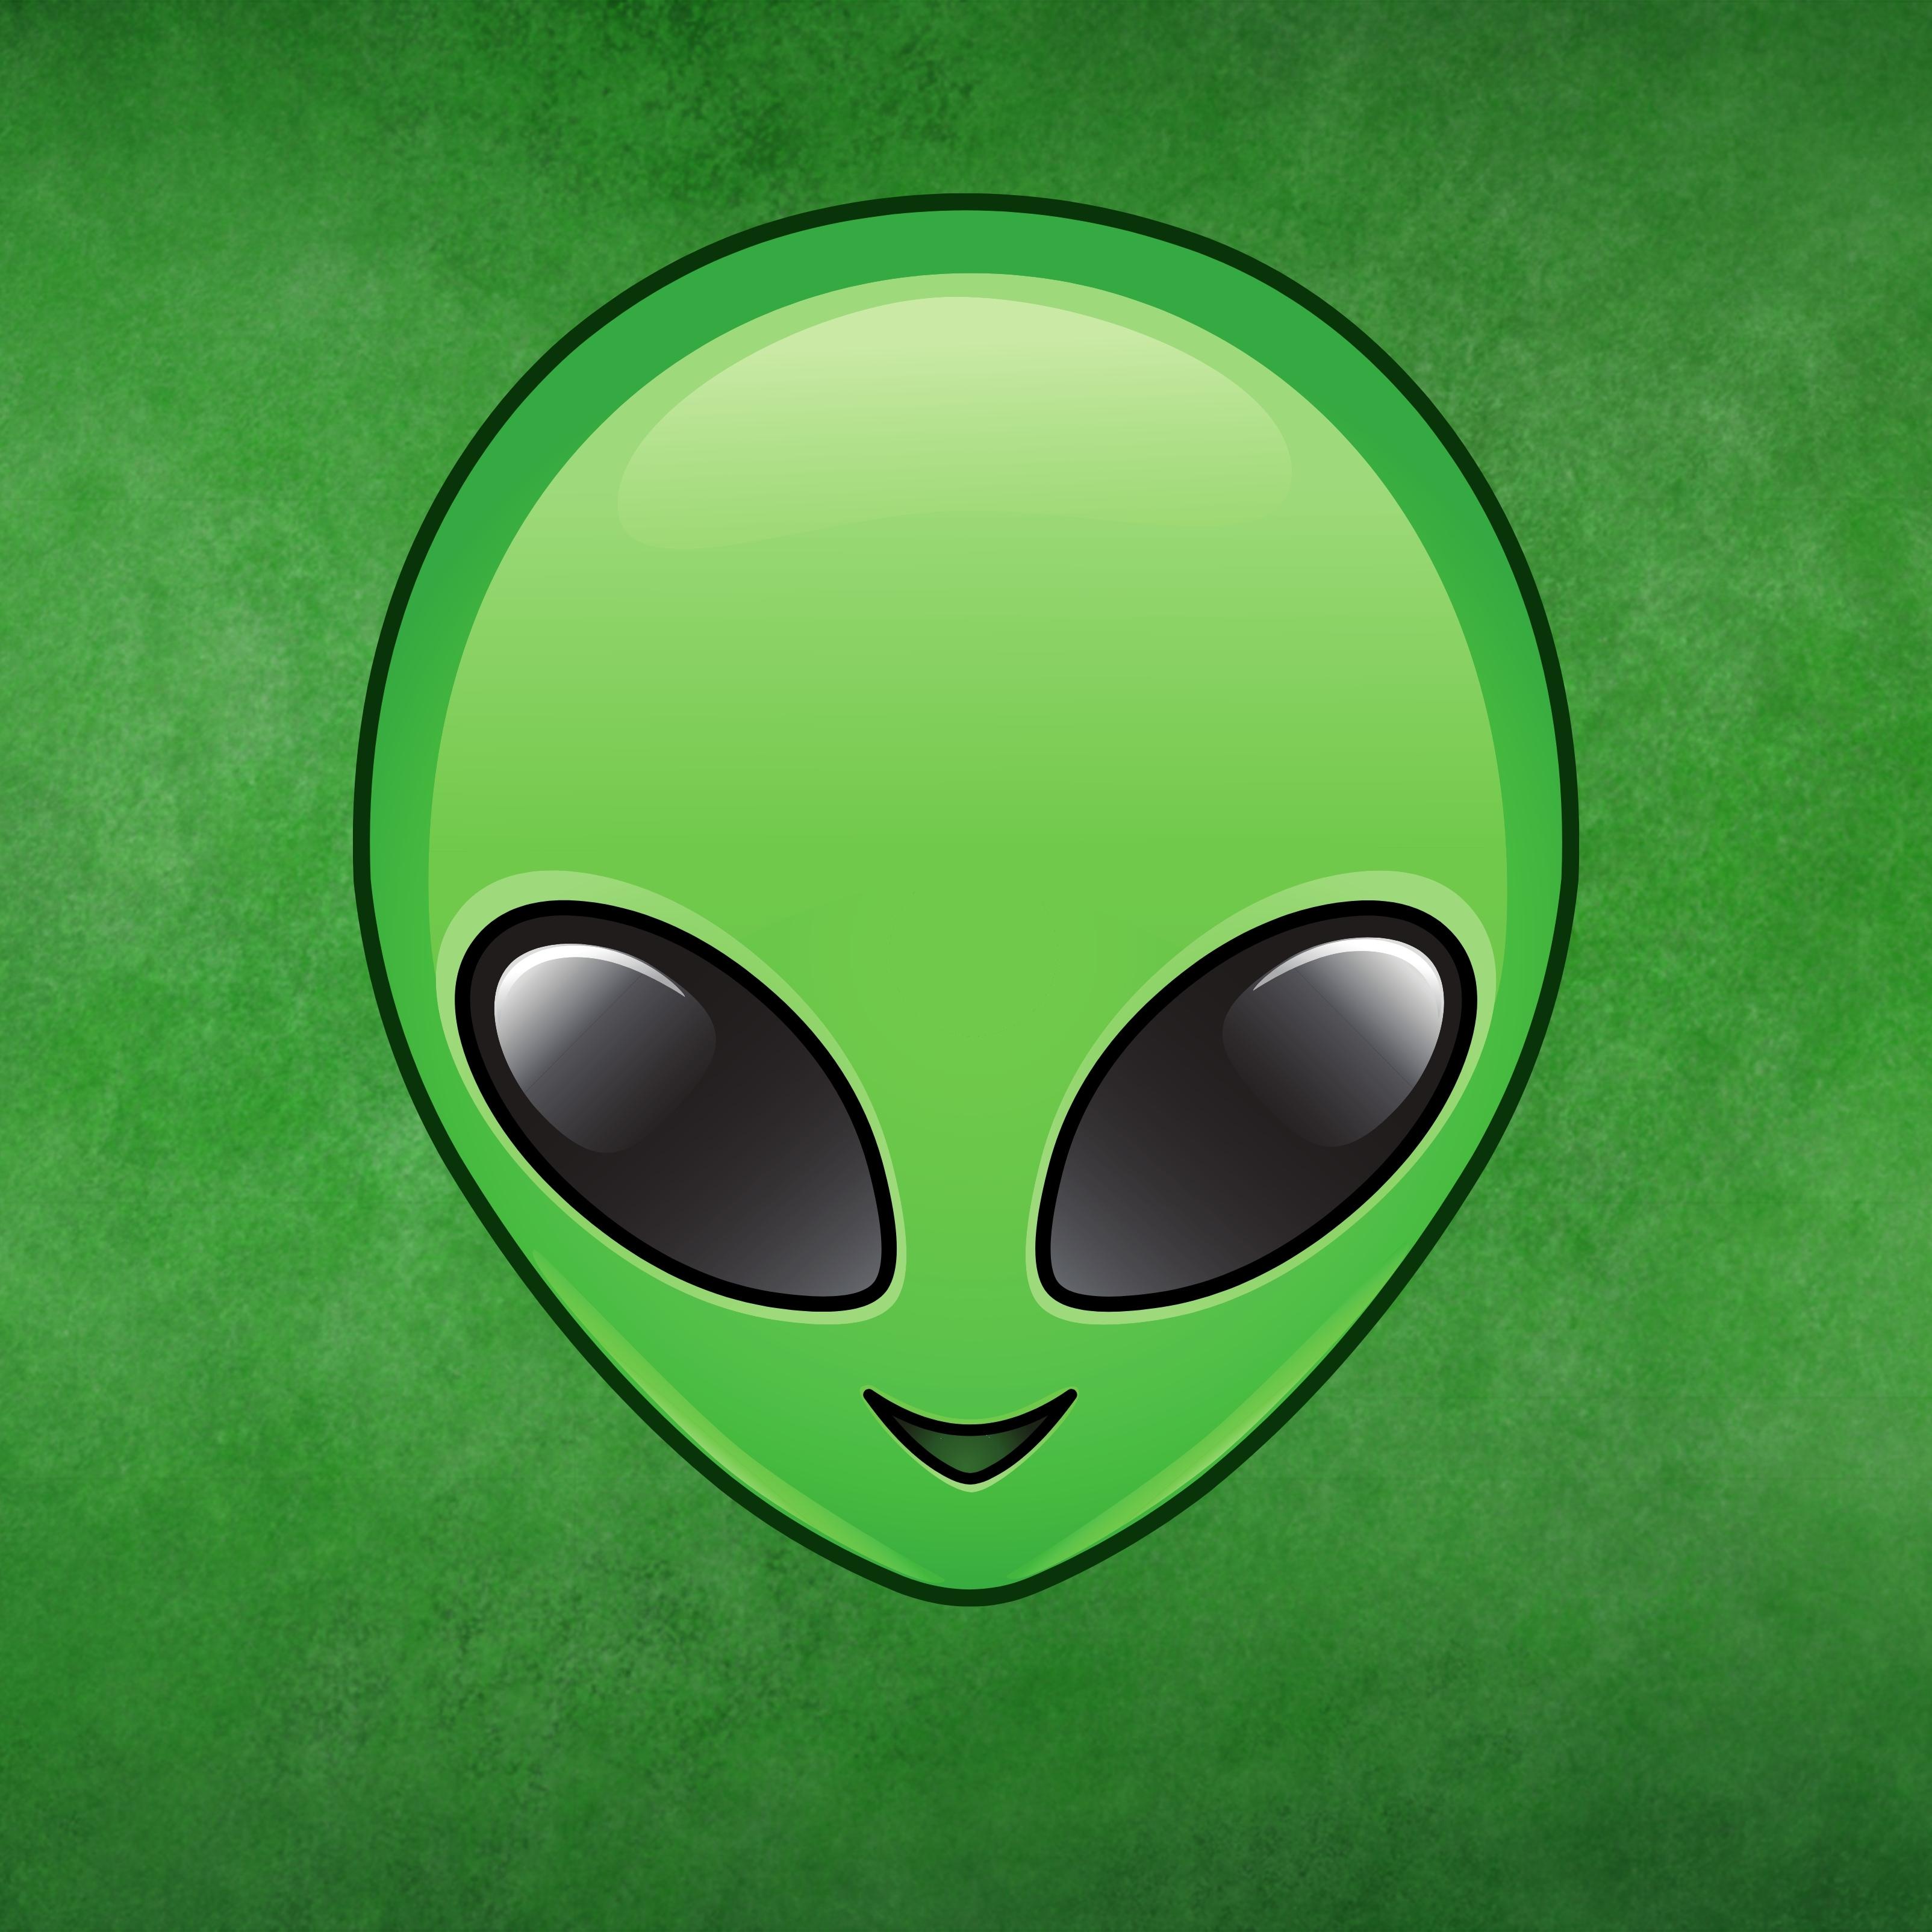 Alien Emoji Face Invader Halloween Spaceship Green iPad Wallpaper